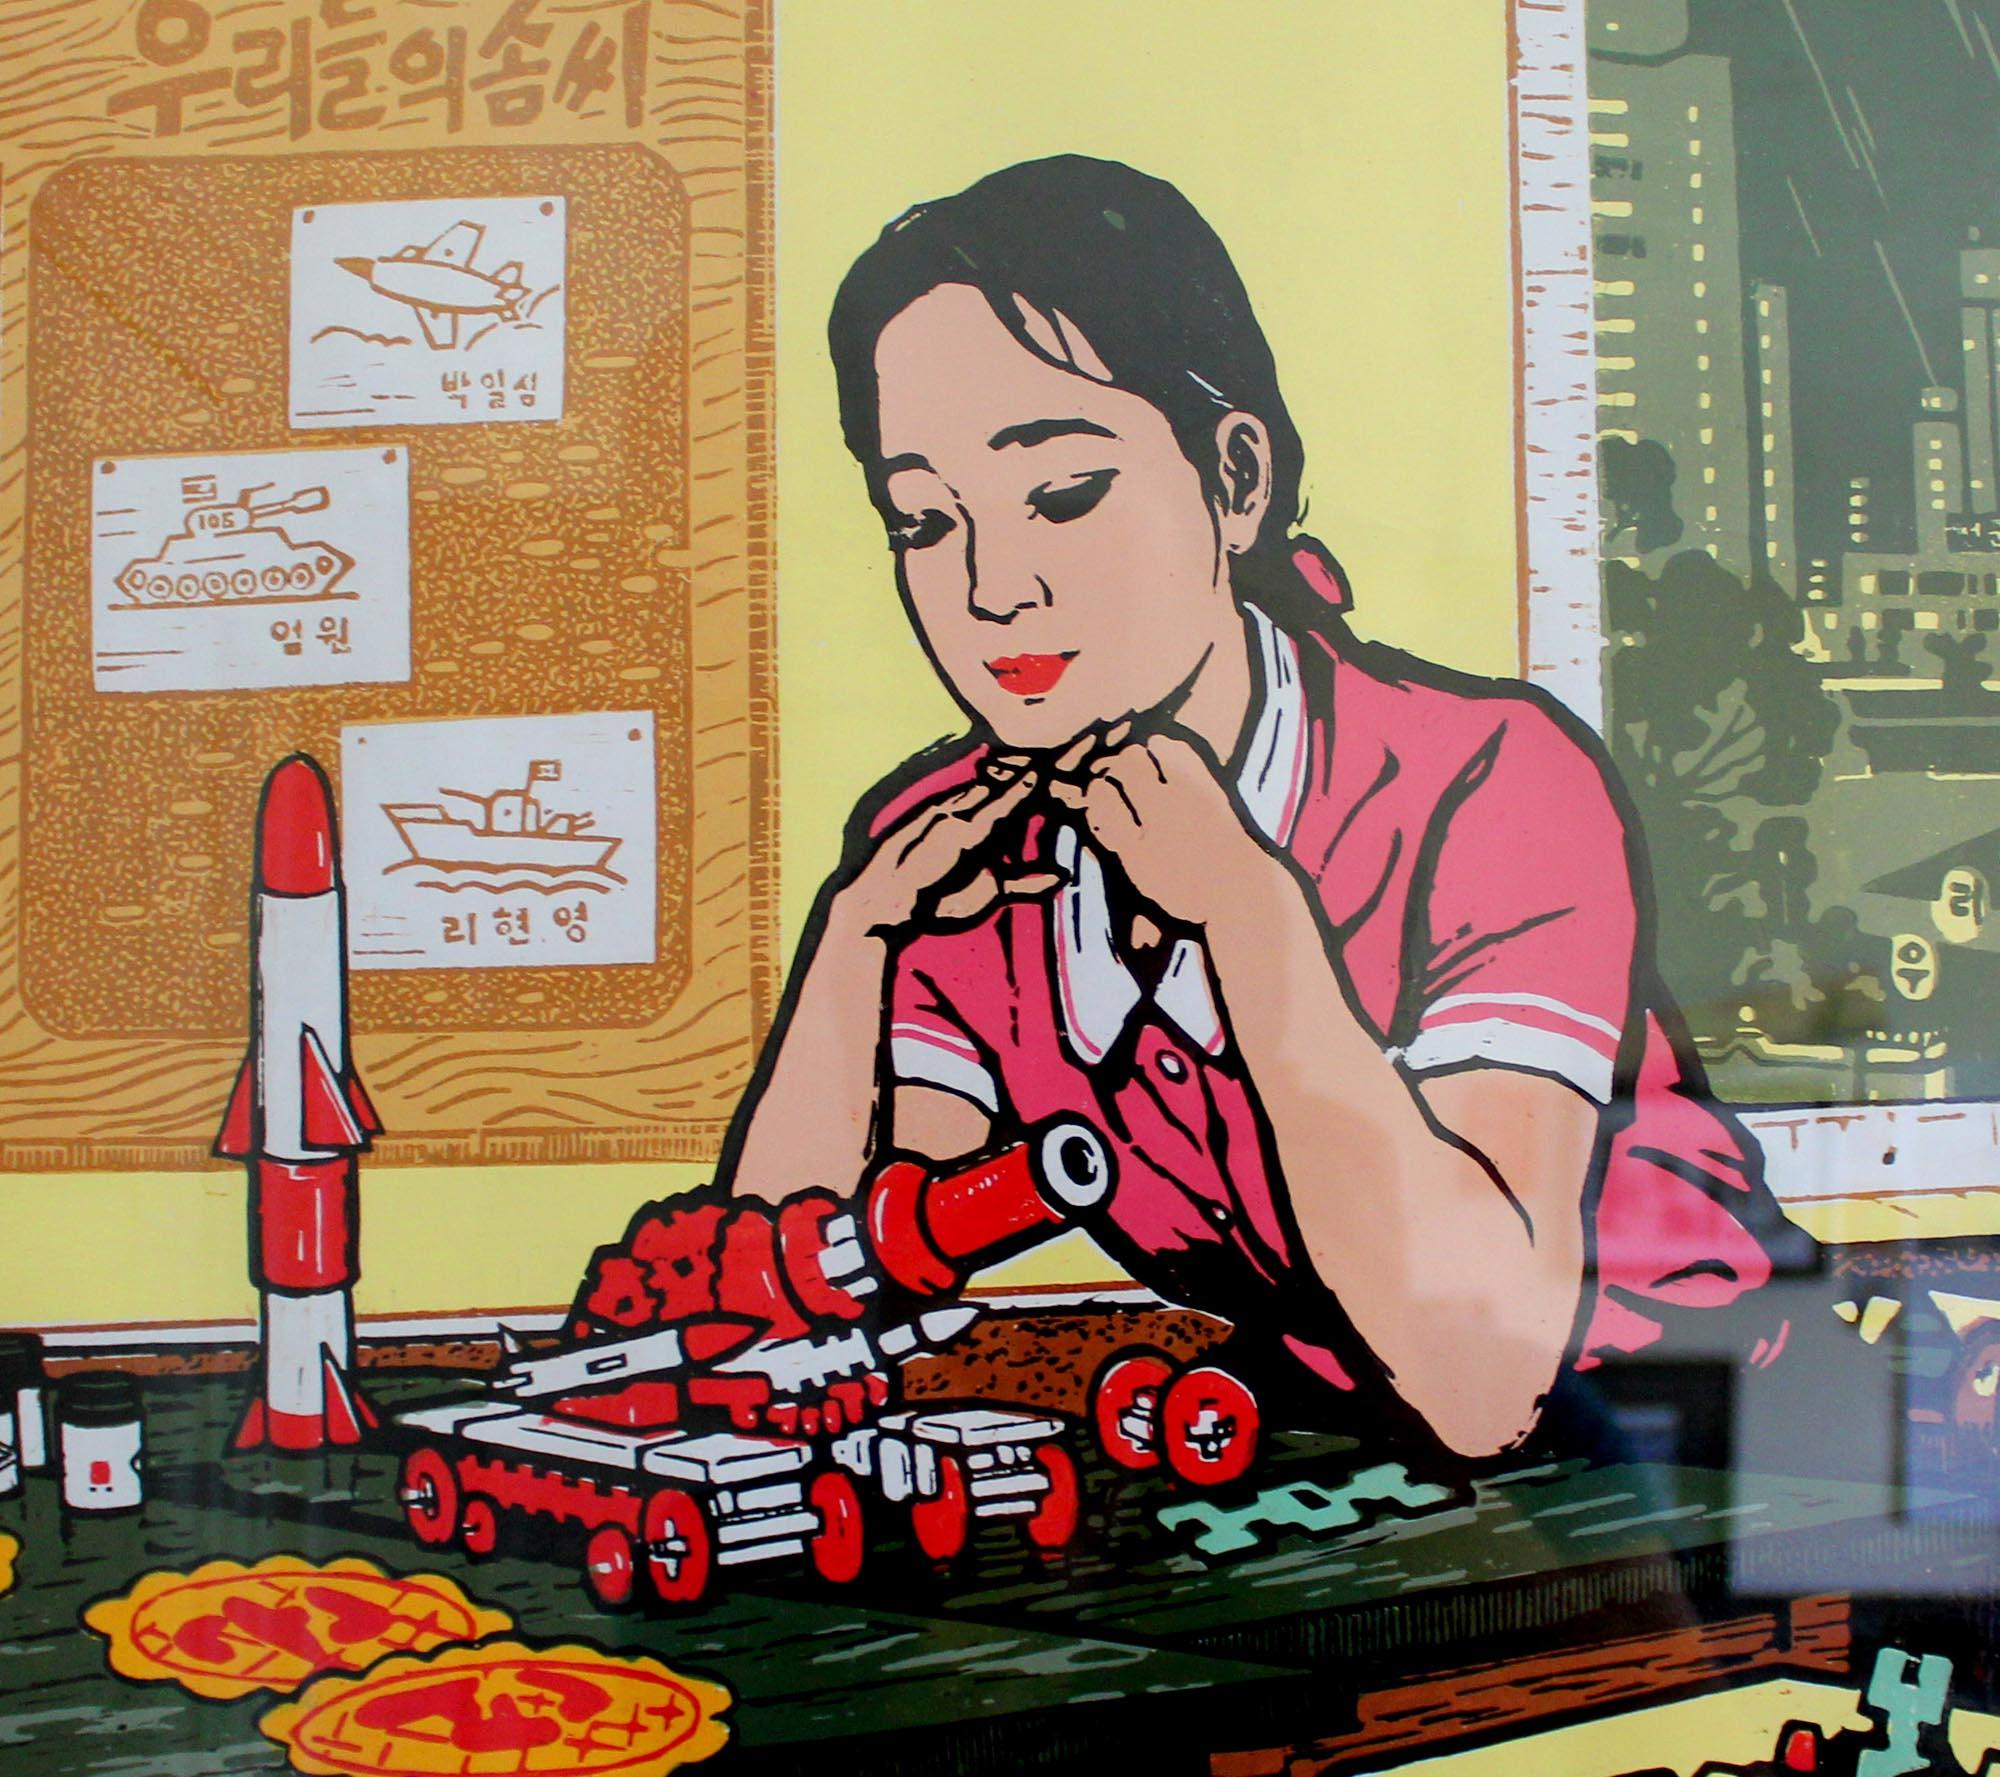 a North Korean propaganda poster showing a girl looking at models of missiles